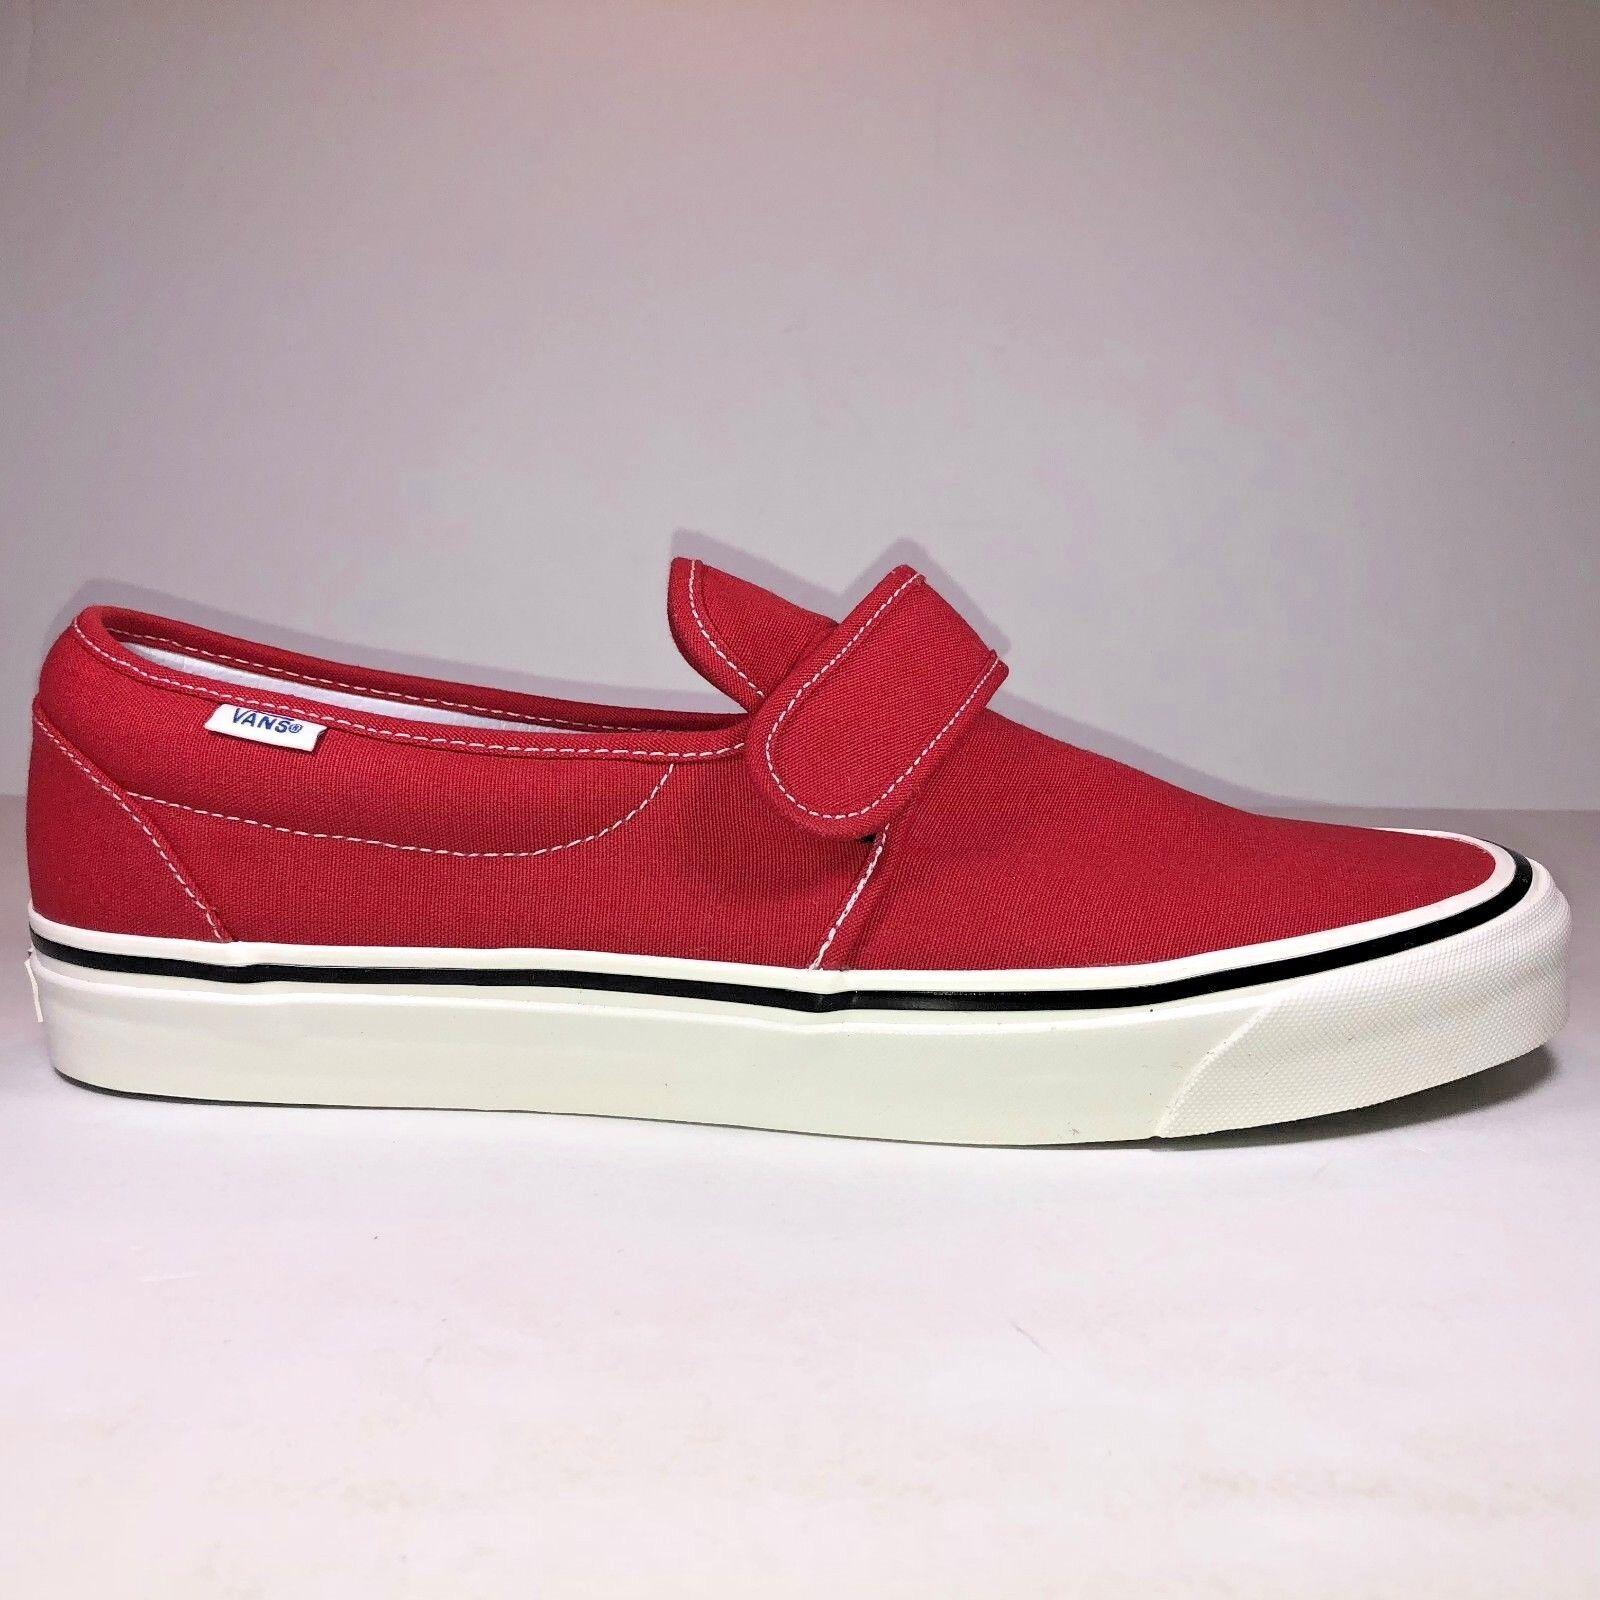 Vans Men Size 6.5 Slip On 47 V DX Anaheim Factory OG Red Sneaker New VN0A3MVAR3V